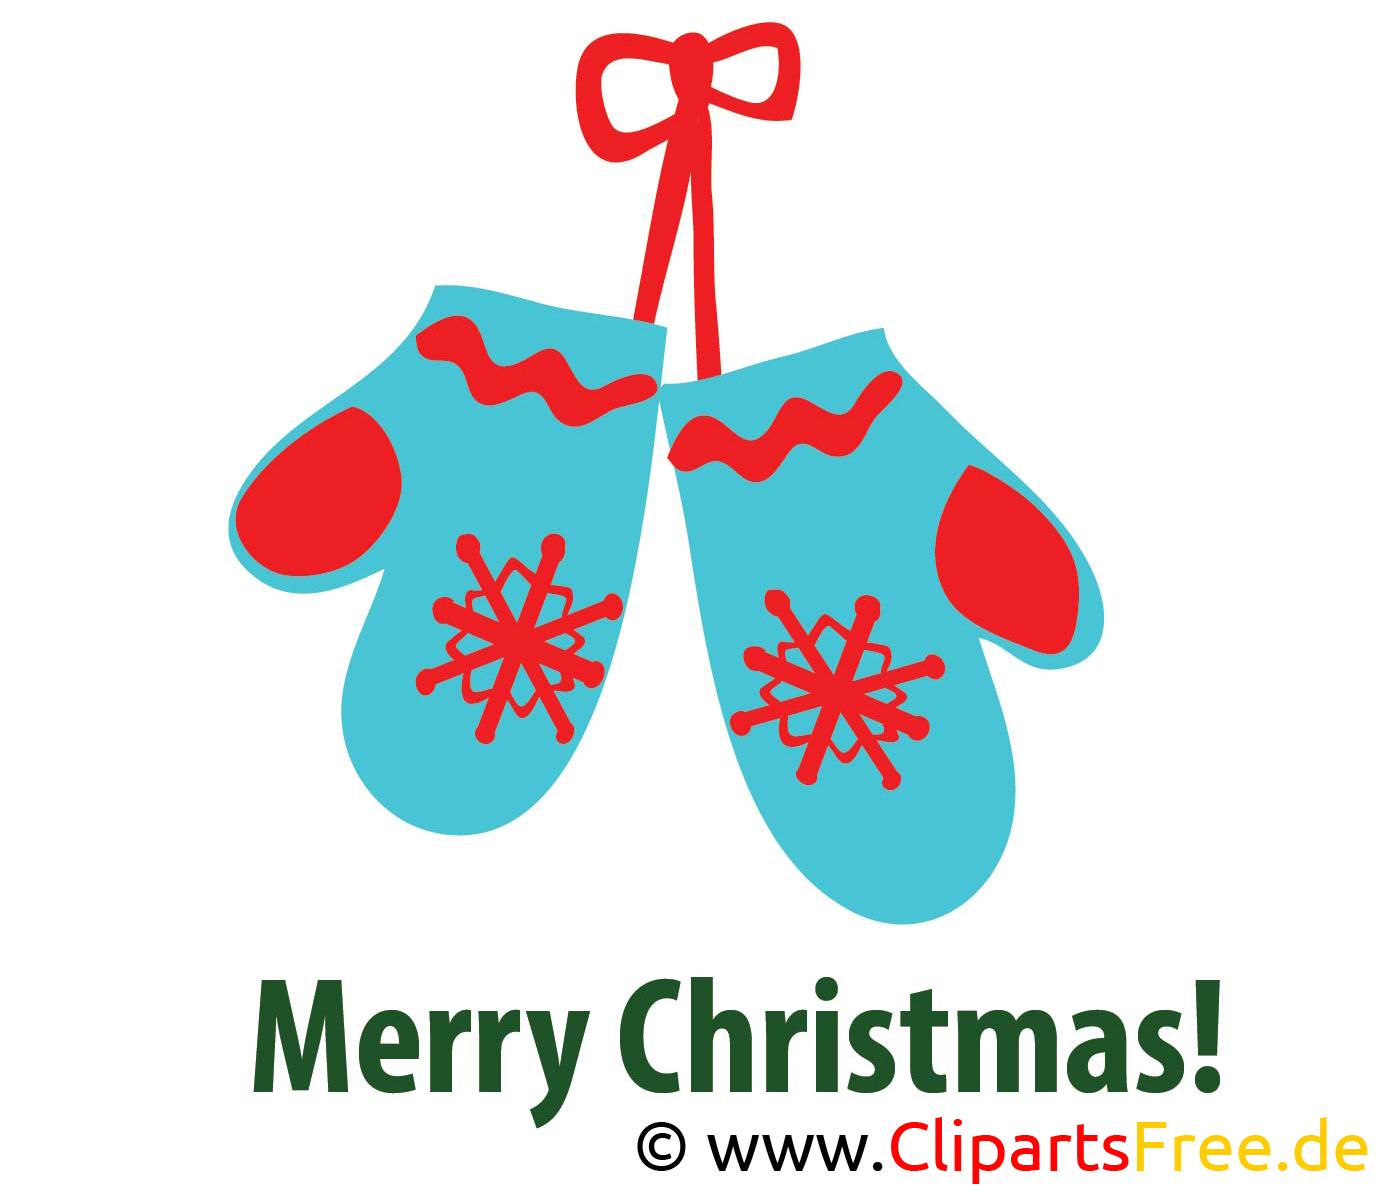 Winterhandschuhe Bild, Clip Art, Image, Grafik, Illustration gratis